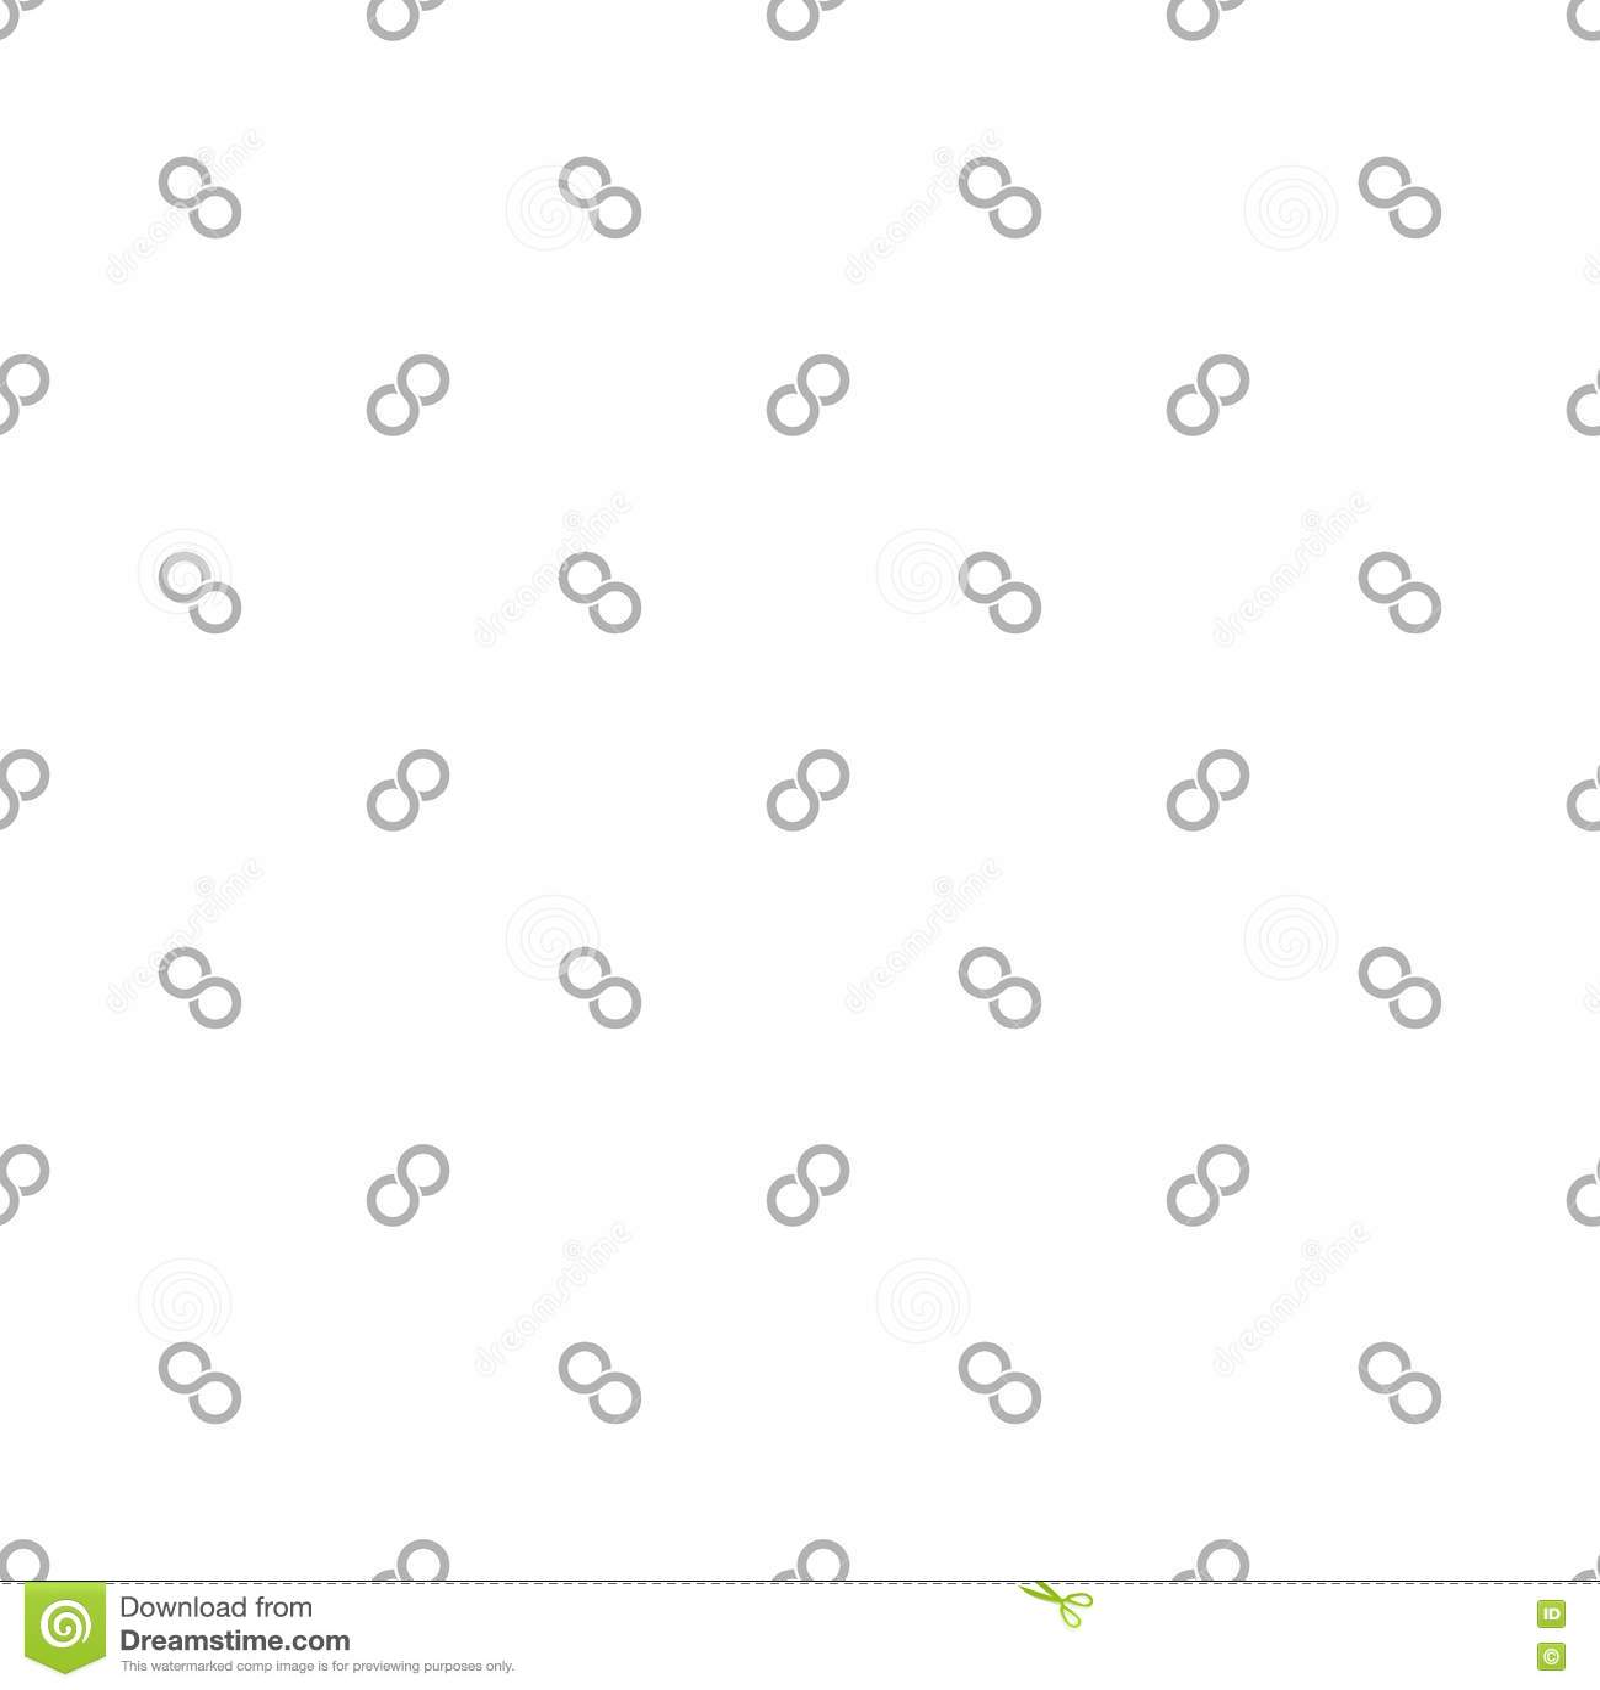 Seamless Pattern Of Infinity Symbol Stock Vector Illustration Of